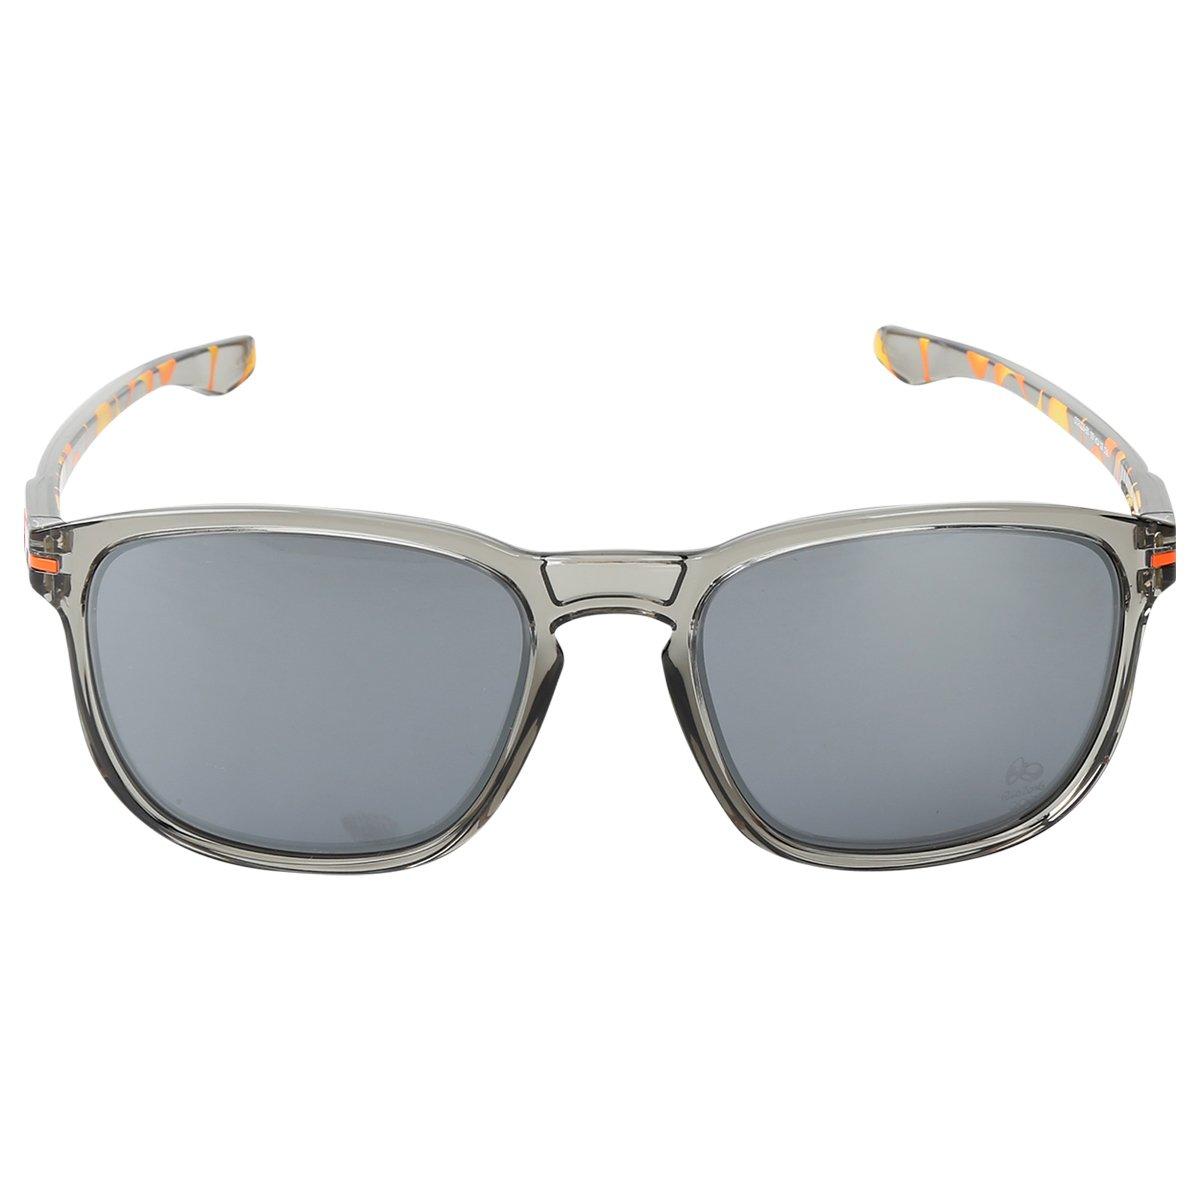 b99083a1e351d Óculos Oakley Enduro Masculino  Óculos Oakley Enduro Masculino ...